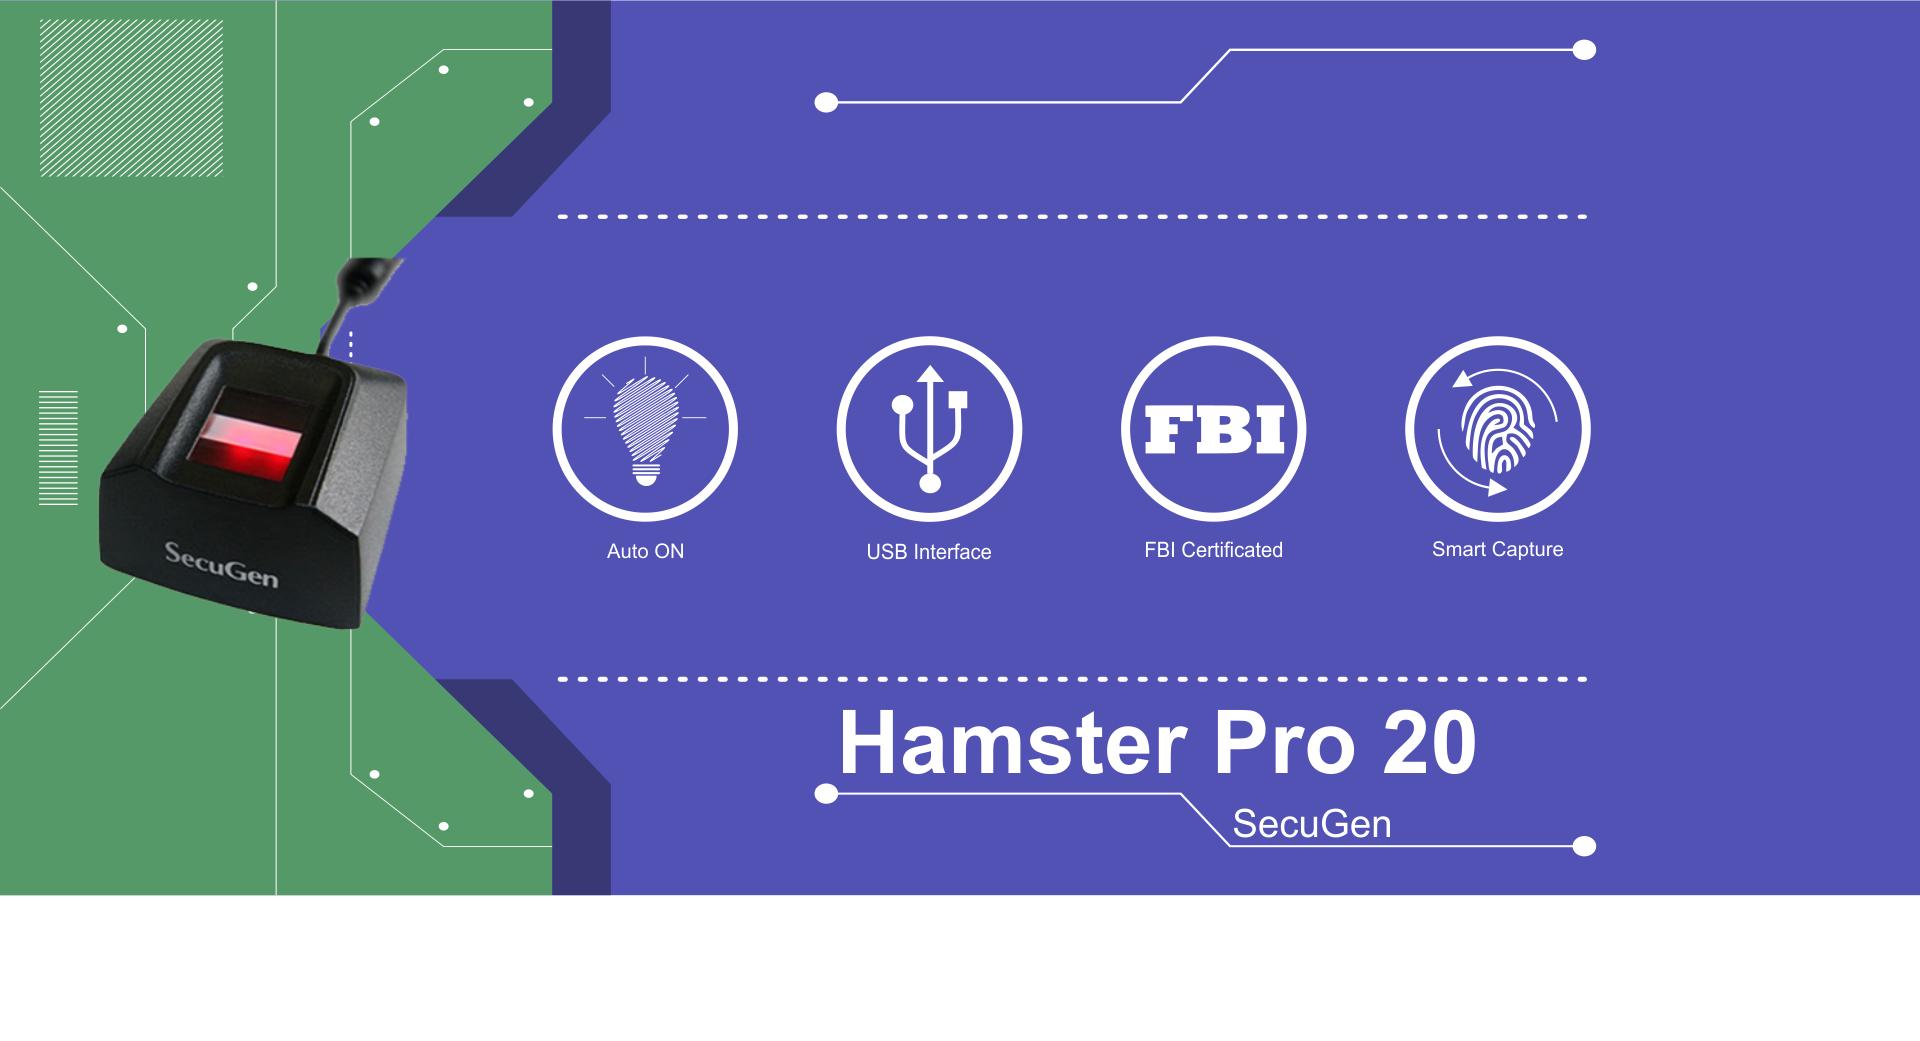 Hamster Pro 20